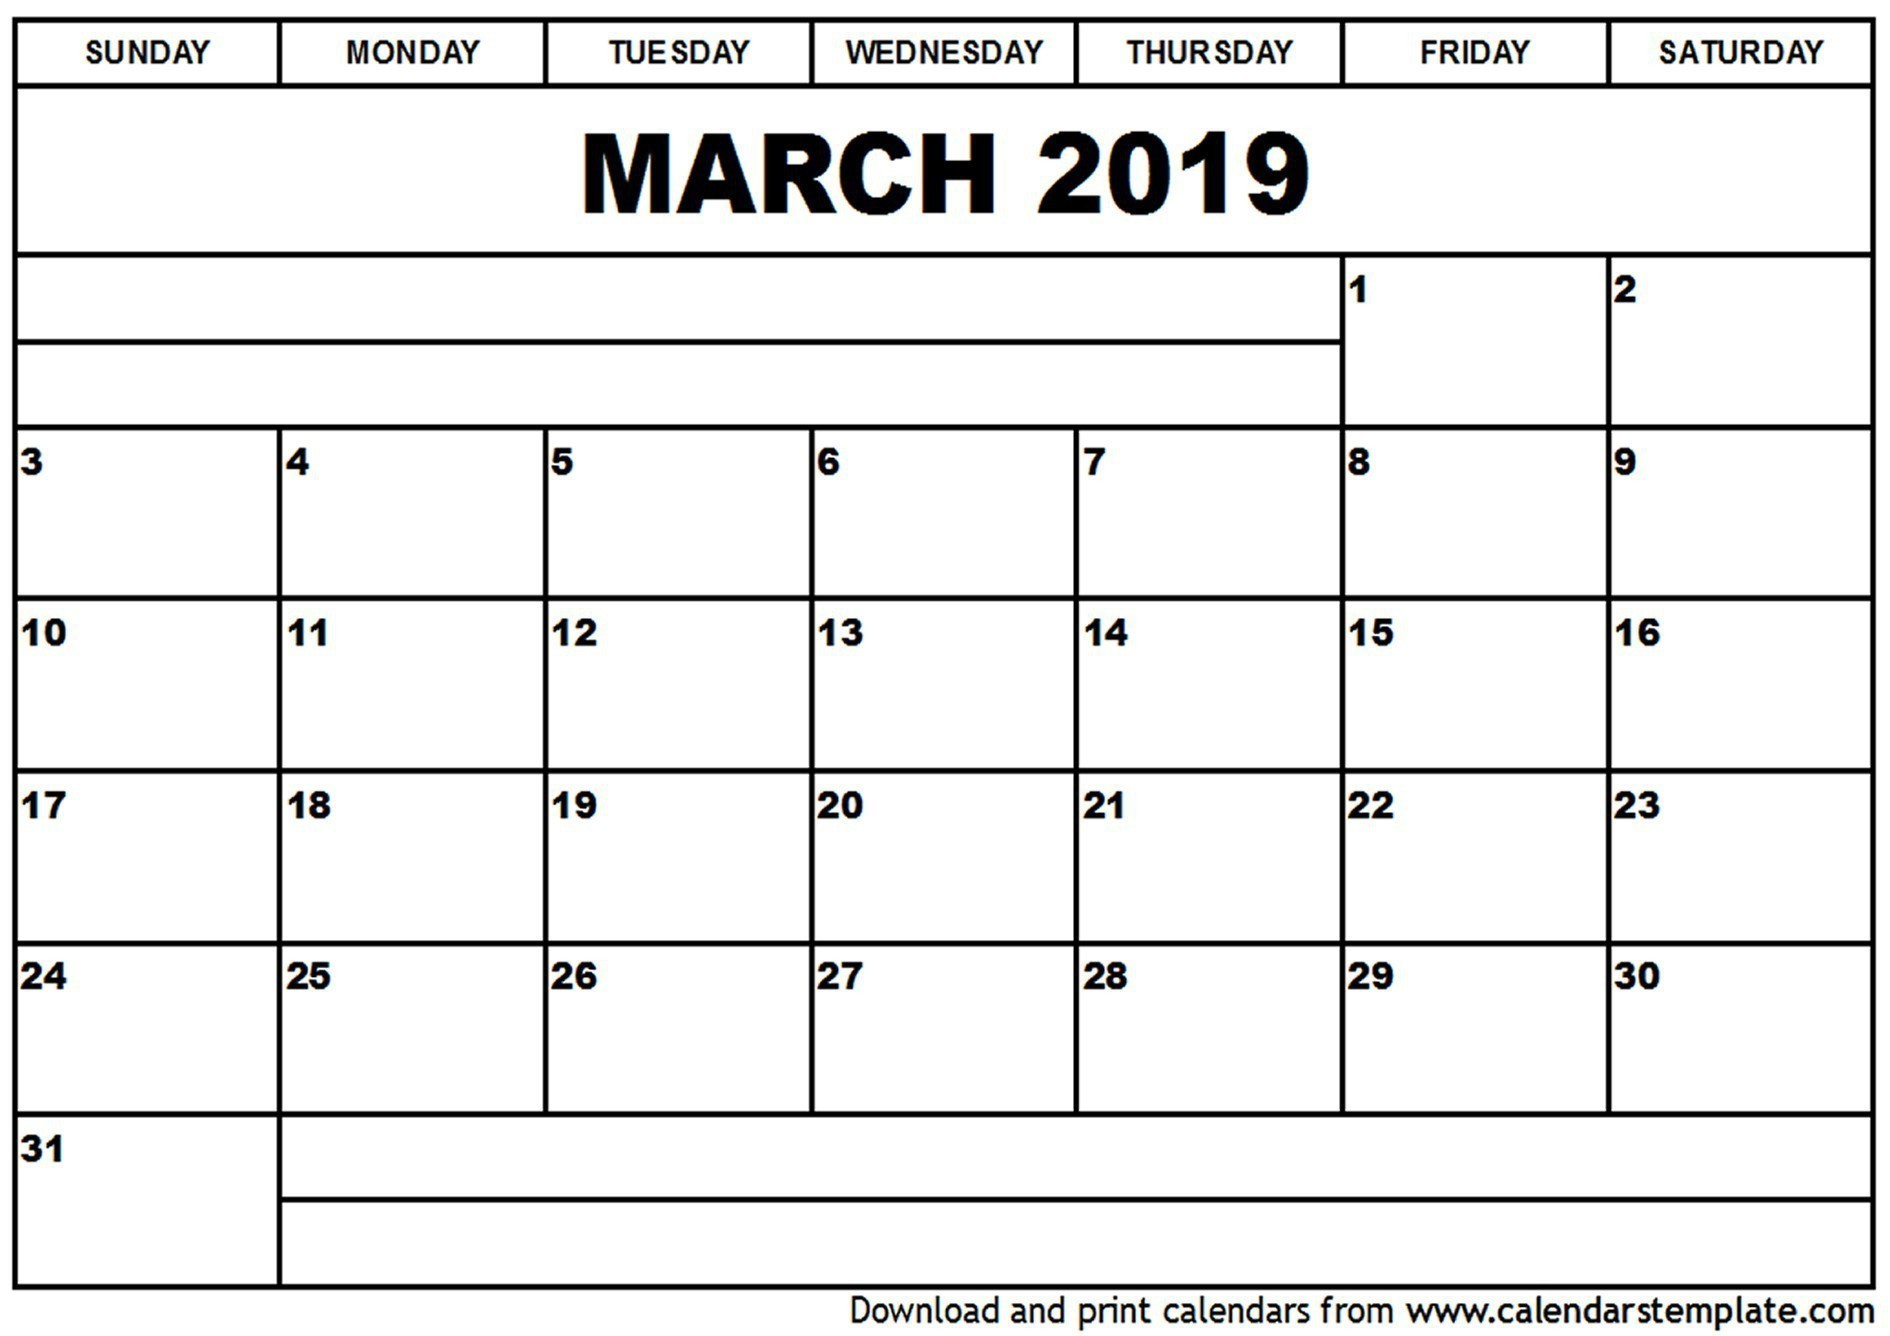 March Calendar 2019 Actual Gujarati Calendar 2019 Printable Printed for No Cost – Calendaro Of March Calendar 2019 Mejores Y Más Novedosos 30 Day Calendar Template Awesome Calendar 1 April 2018 to 31 March